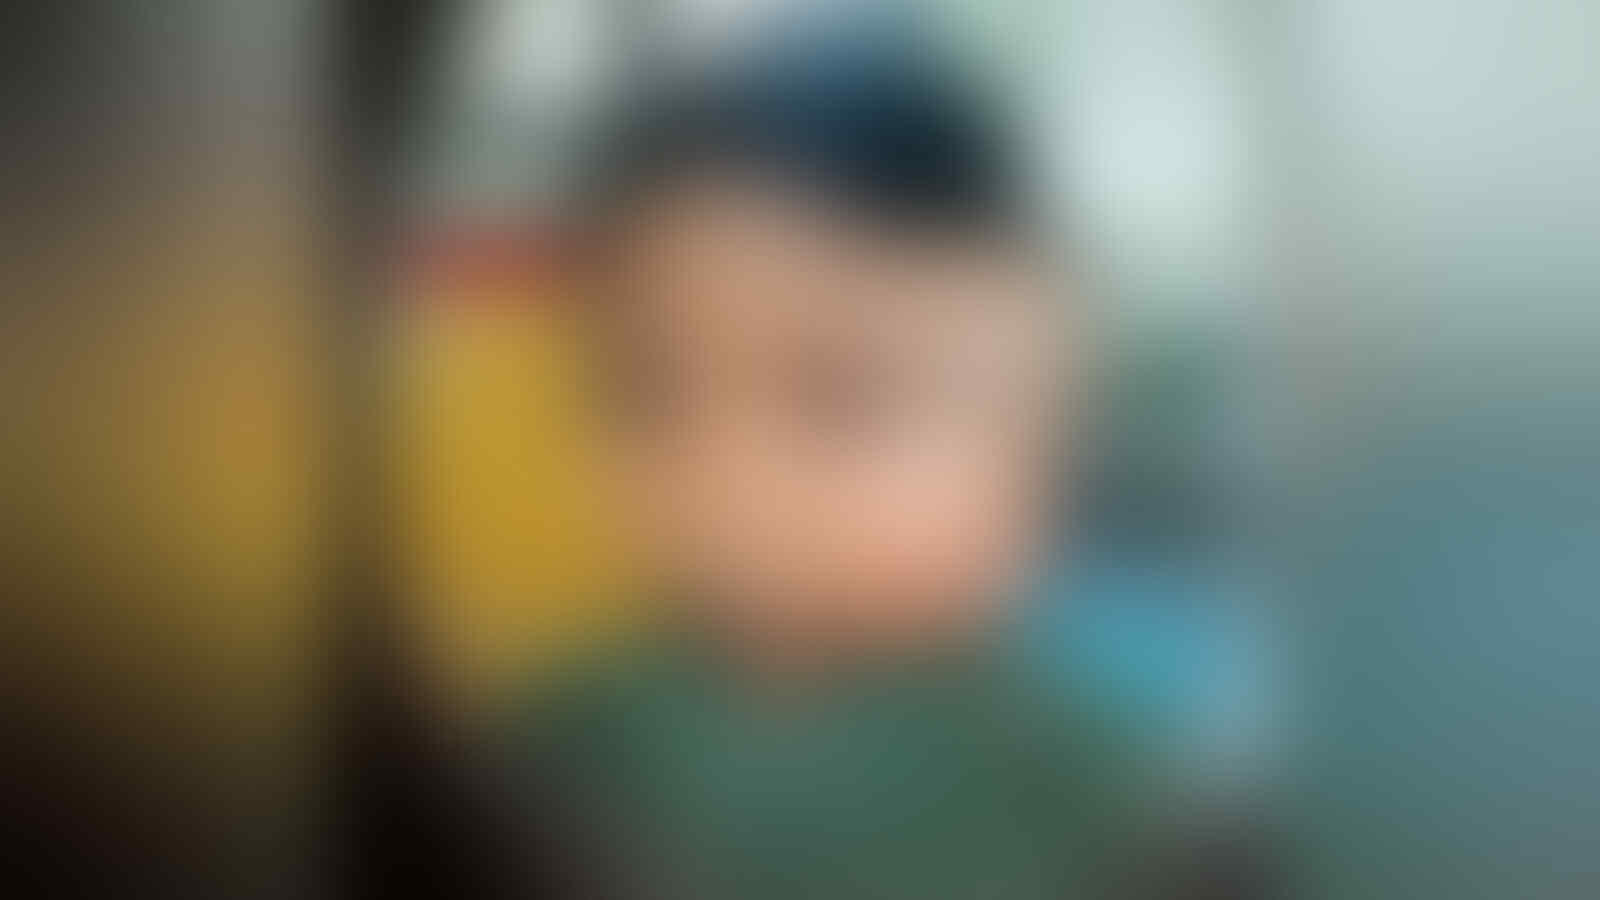 Rangkum 4 Mei 2018: Tumor Elvira hingga Aliran Dana Pendemo May Day